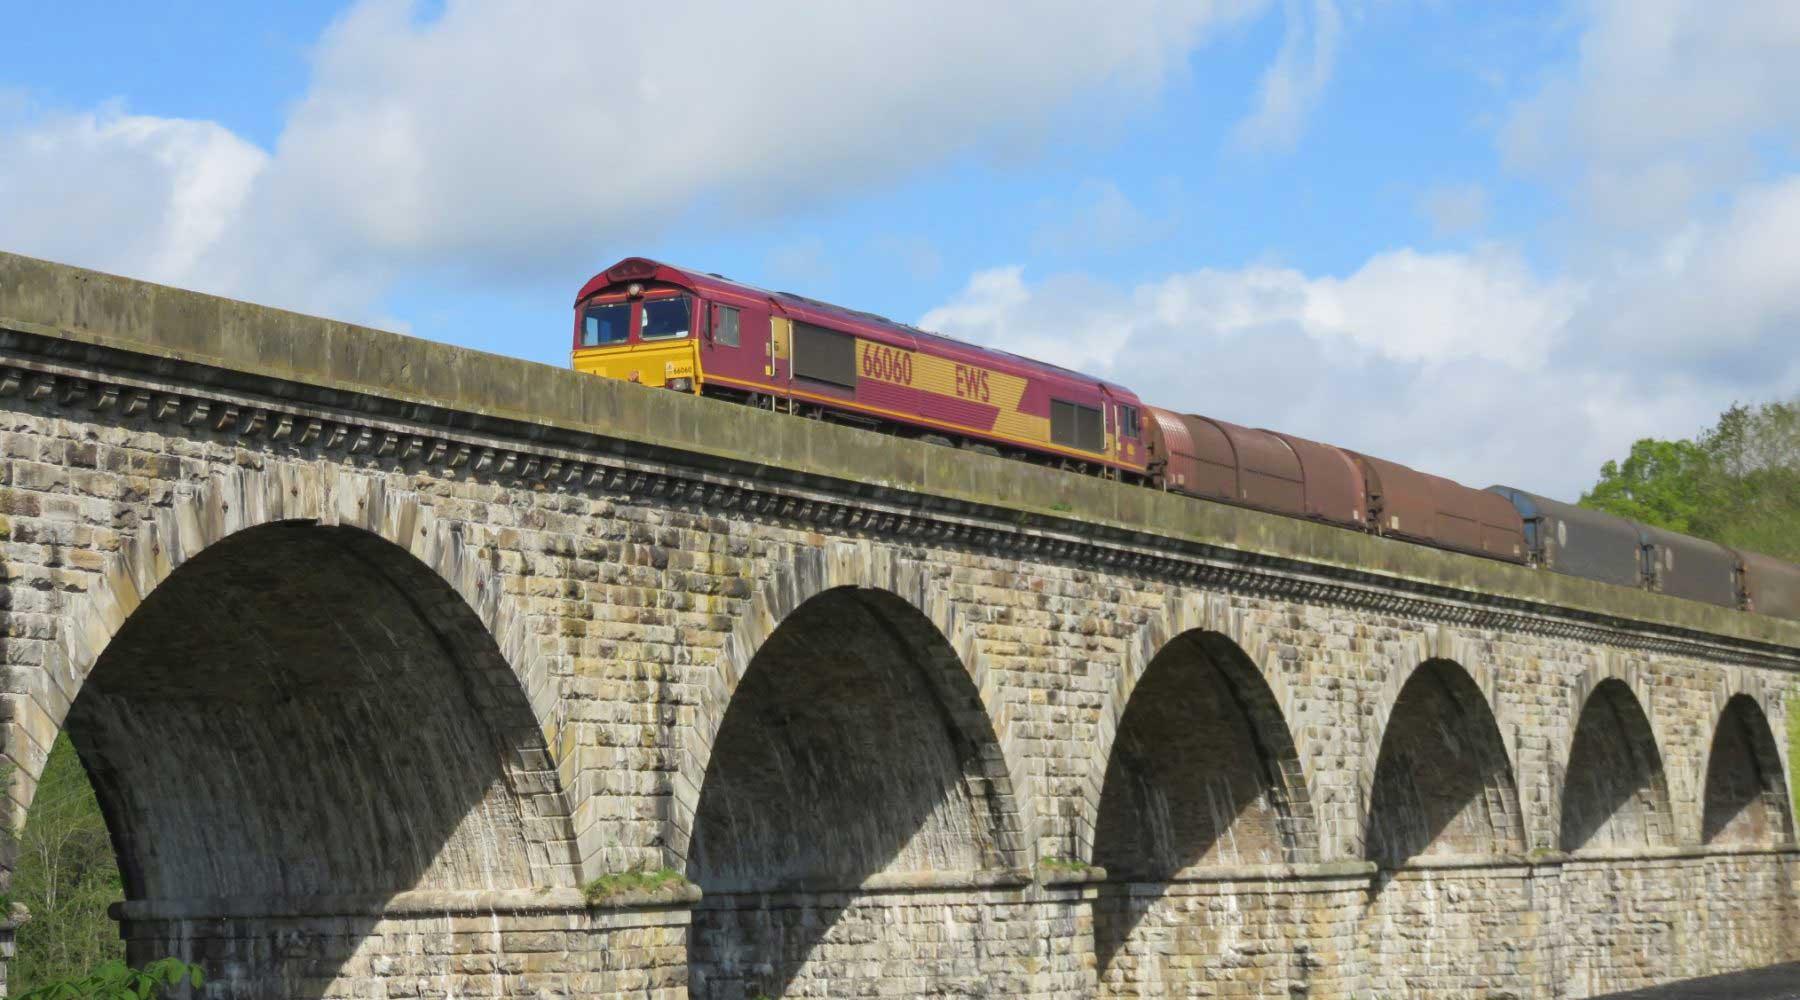 *Train on chirk viaduct